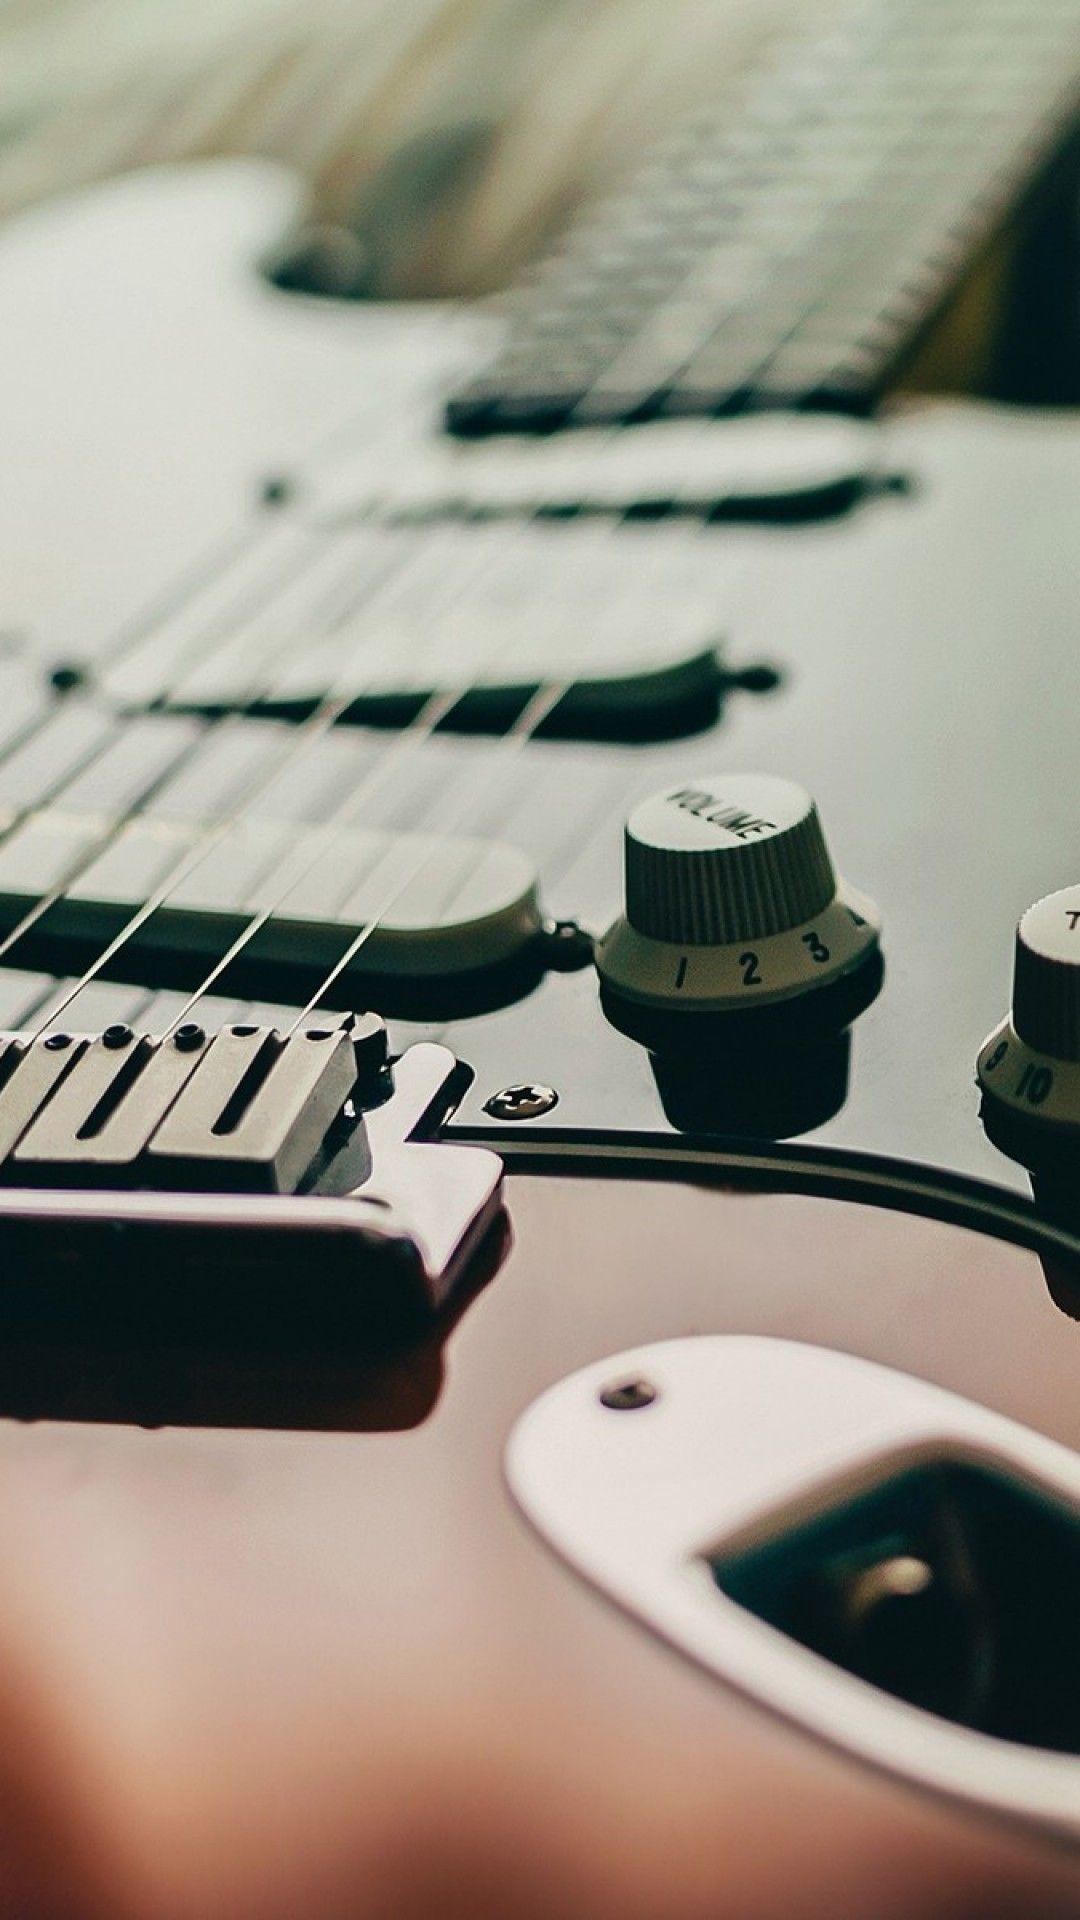 Hd Bass Guitar Wallpaper 67 Images Electric Guitar Photography Guitar Photography Guitar Wallpaper Iphone